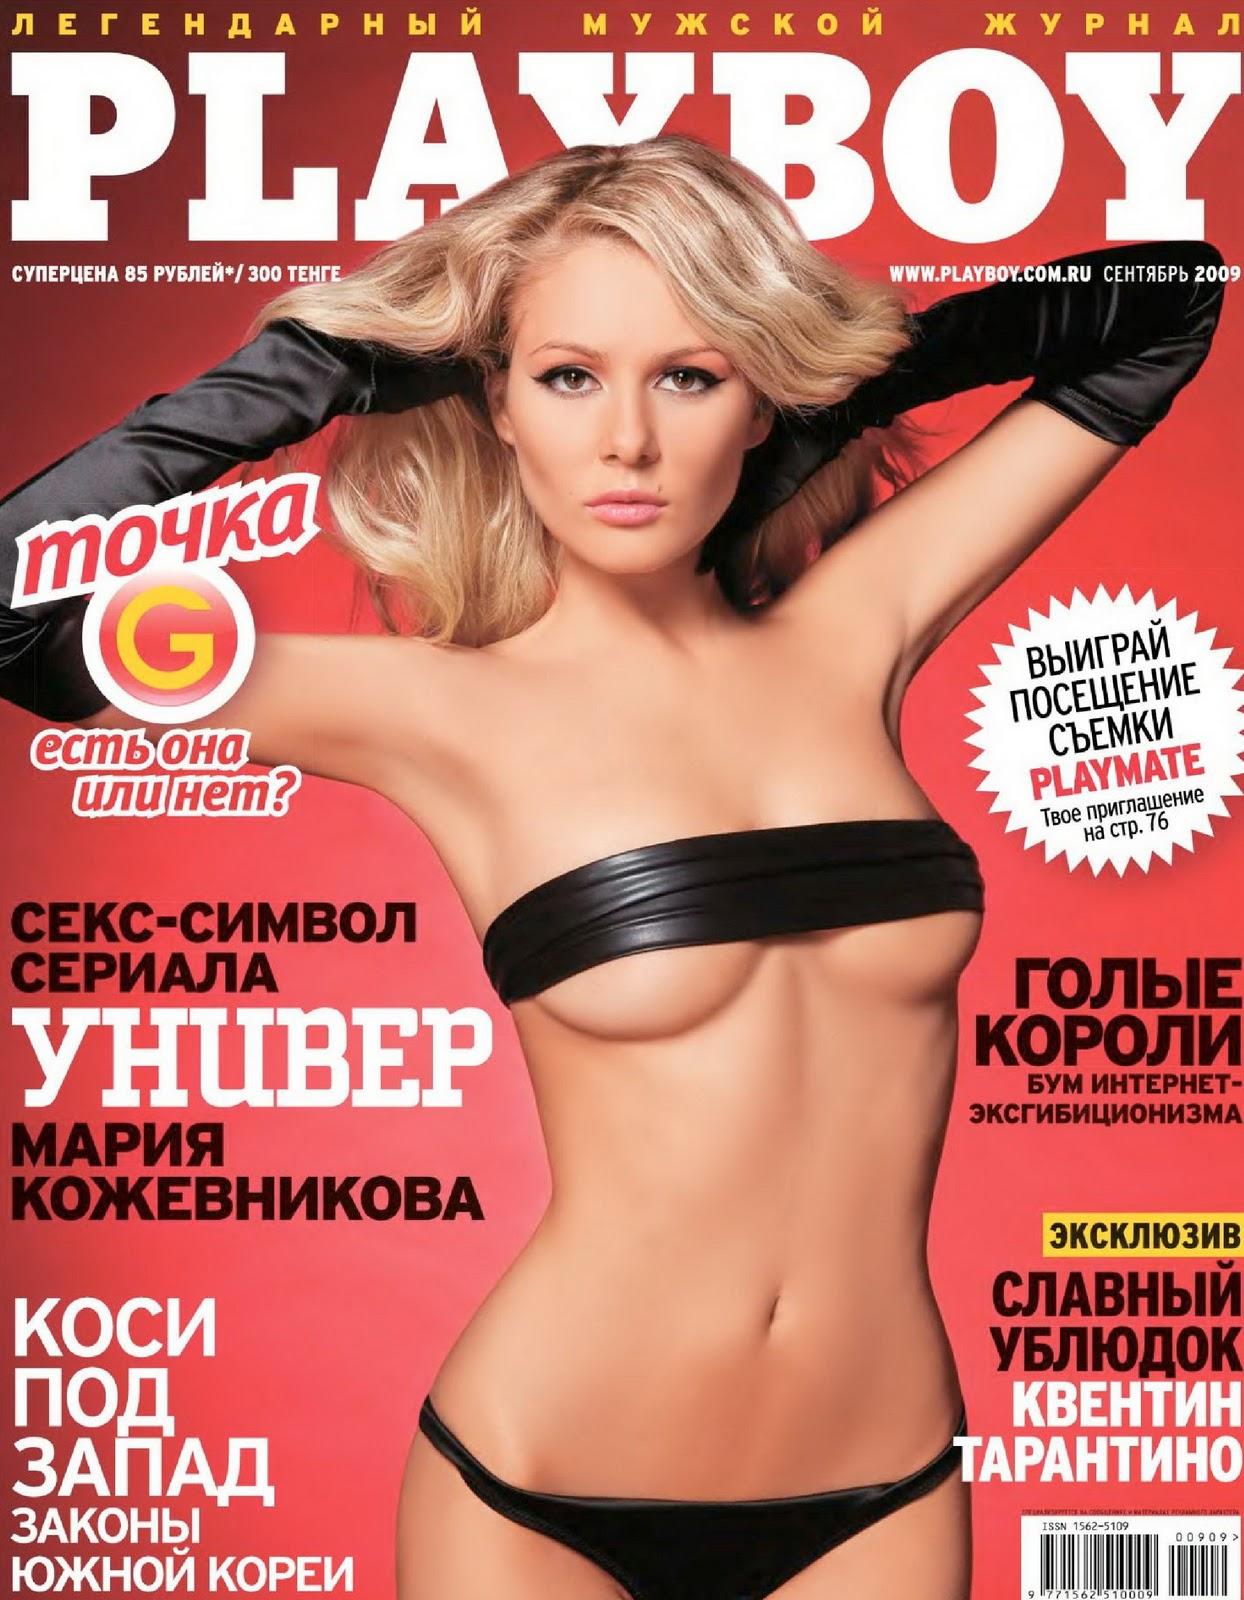 http://4.bp.blogspot.com/-M2FMZHx1HLo/TuSJu57crhI/AAAAAAAAENU/2yn6E6PRMXU/s1600/Playboy092009Ru_p0001.jpg